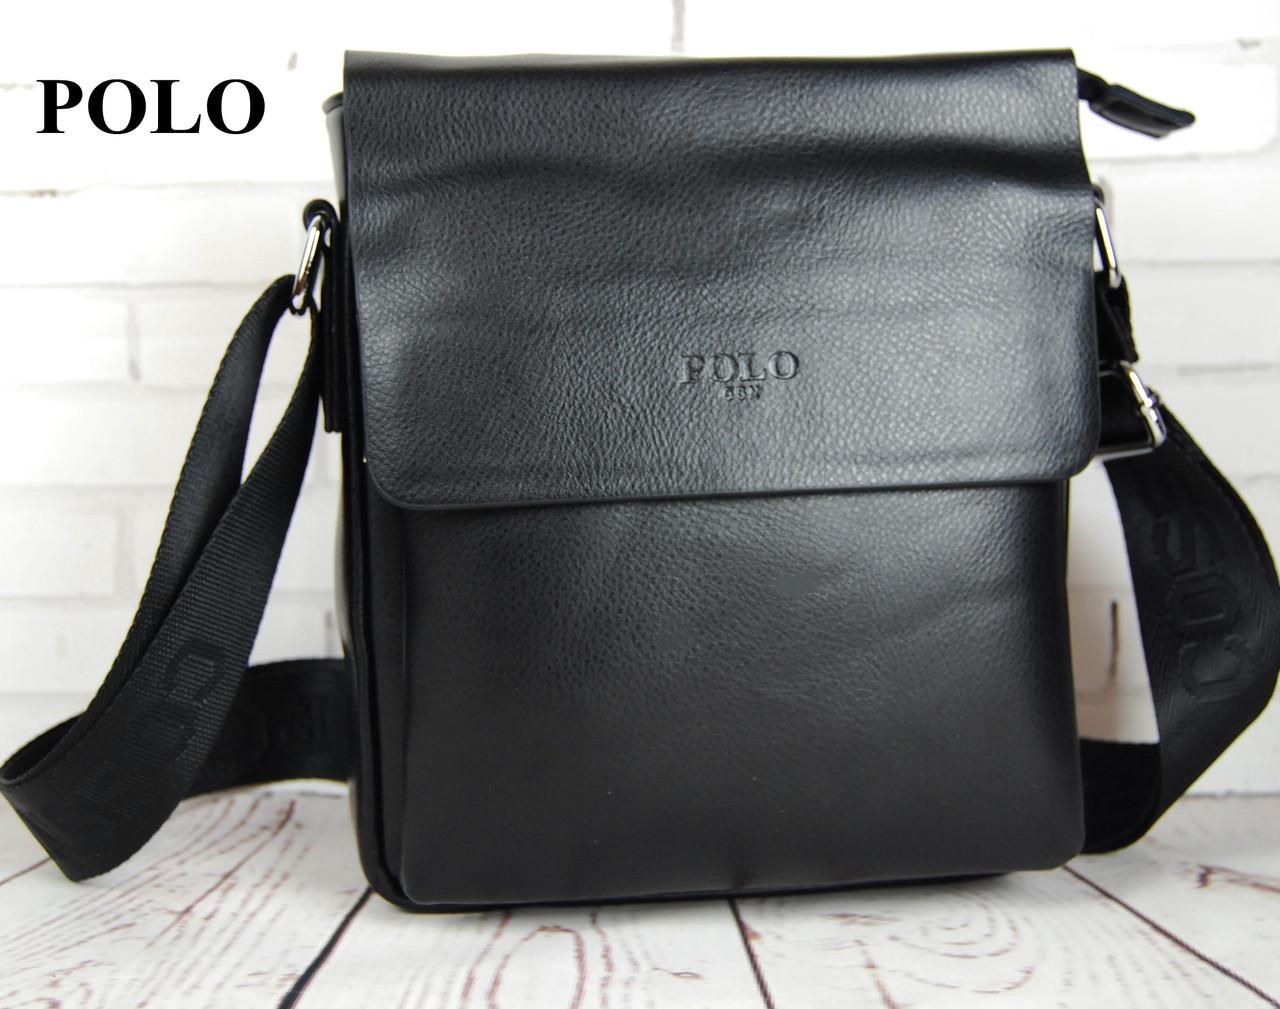 8a473f72bdf5 Мужская сумка - планшет Polo. Барсетка мужская Размер 23*20 см КС36 -  Интернет